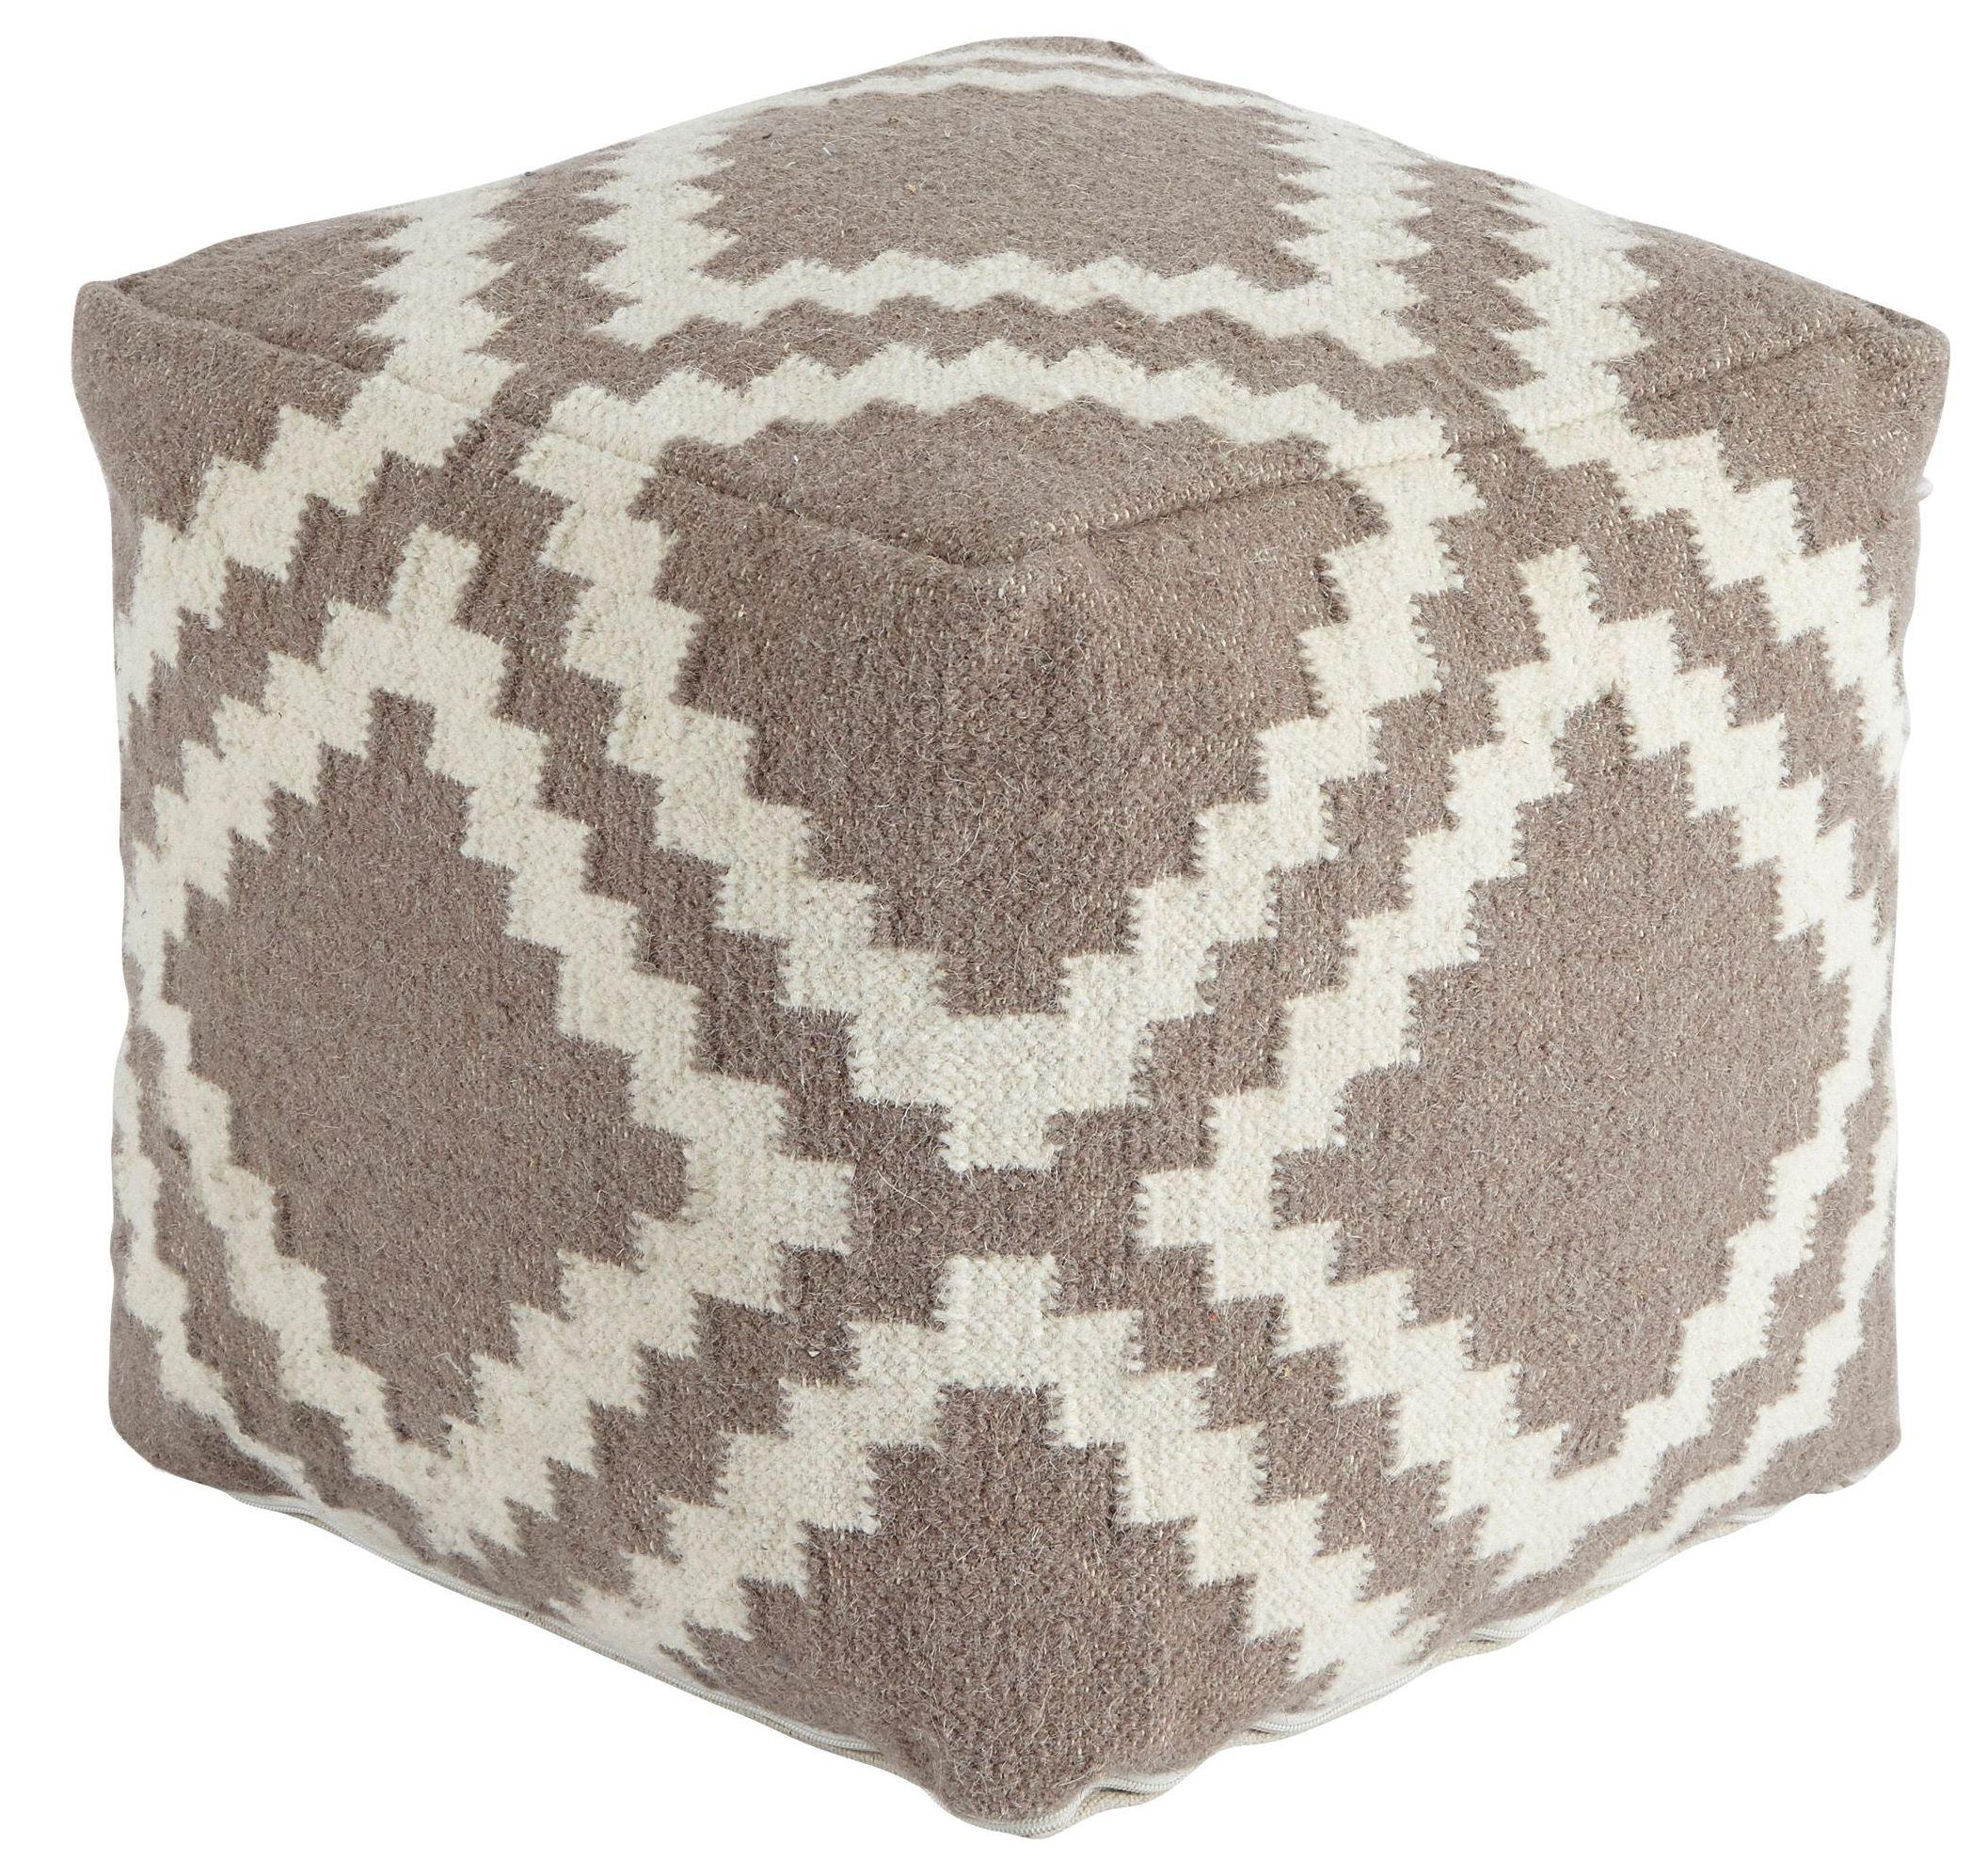 Ashley Furniture Louisville Kentucky: Geometric Gray/White Pouf From Ashley (A1000418)